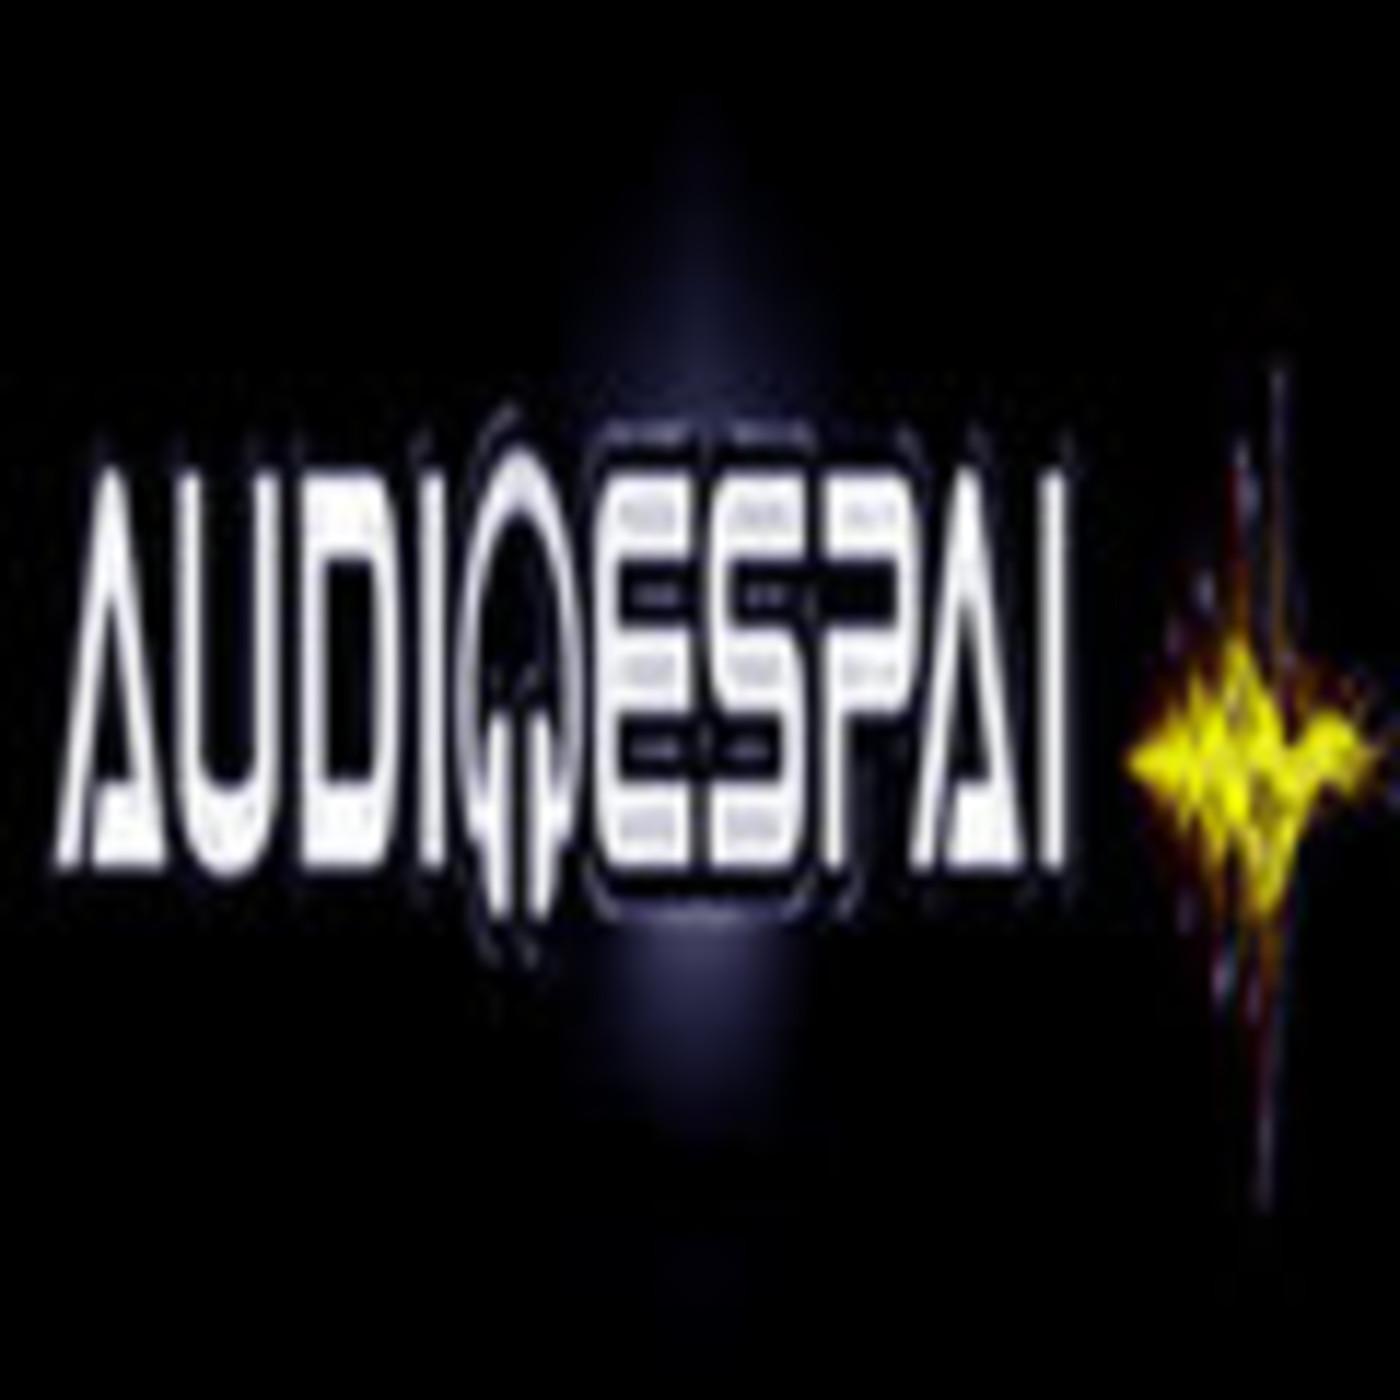 Audioespai